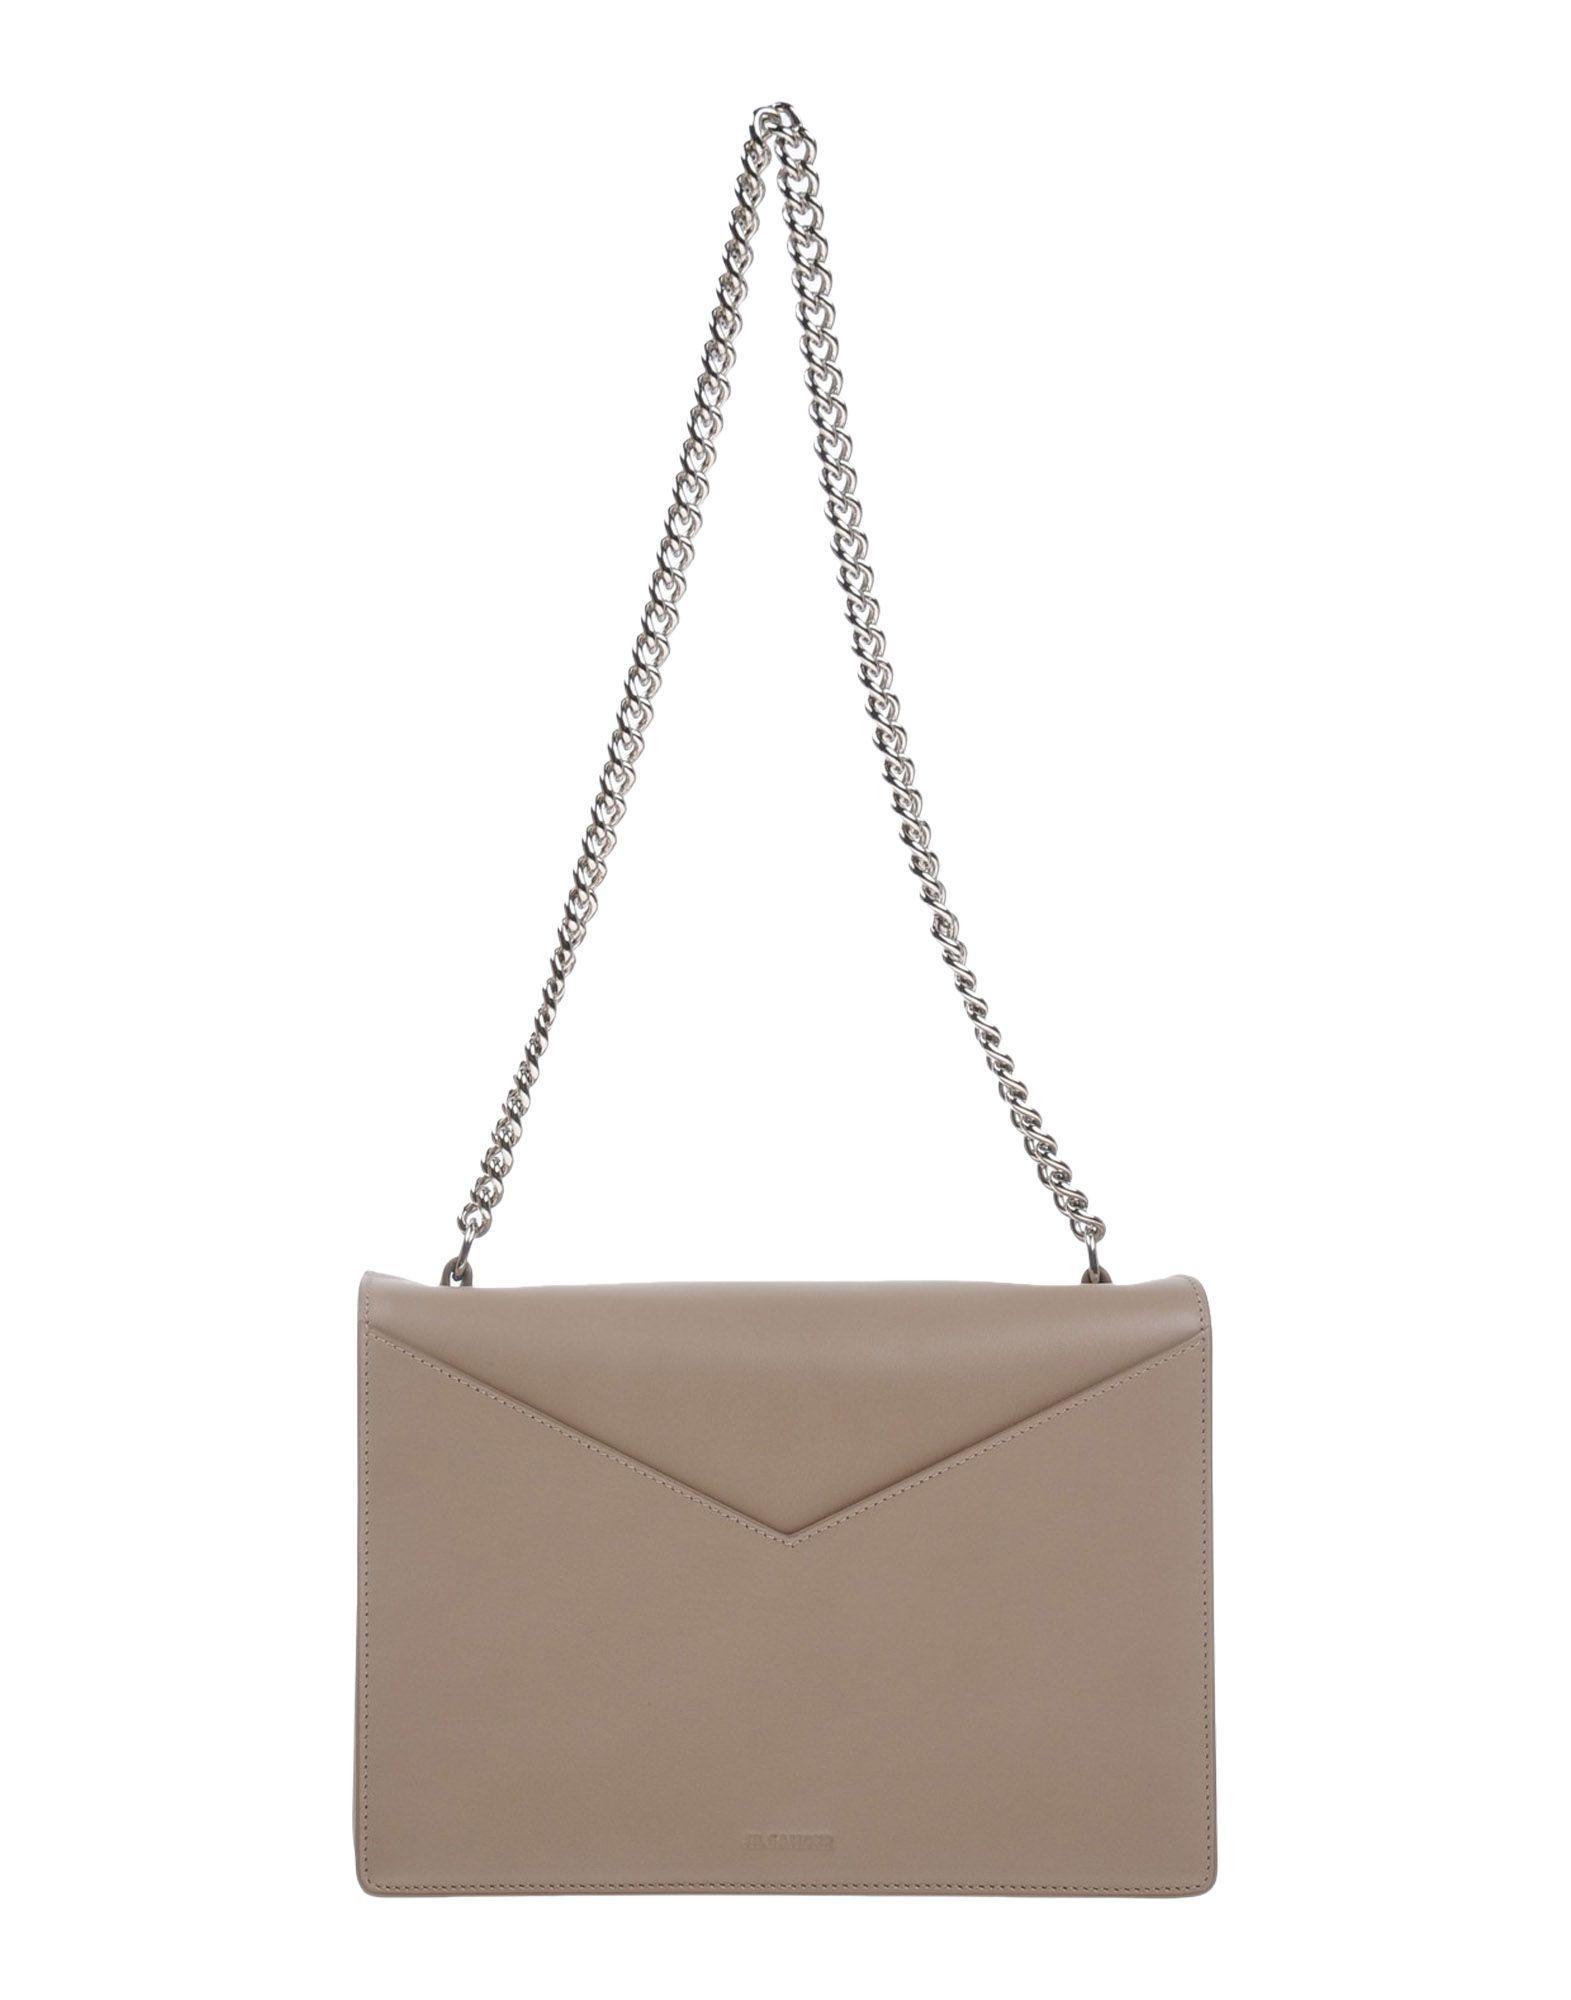 Jil Sander Handbags In Khaki